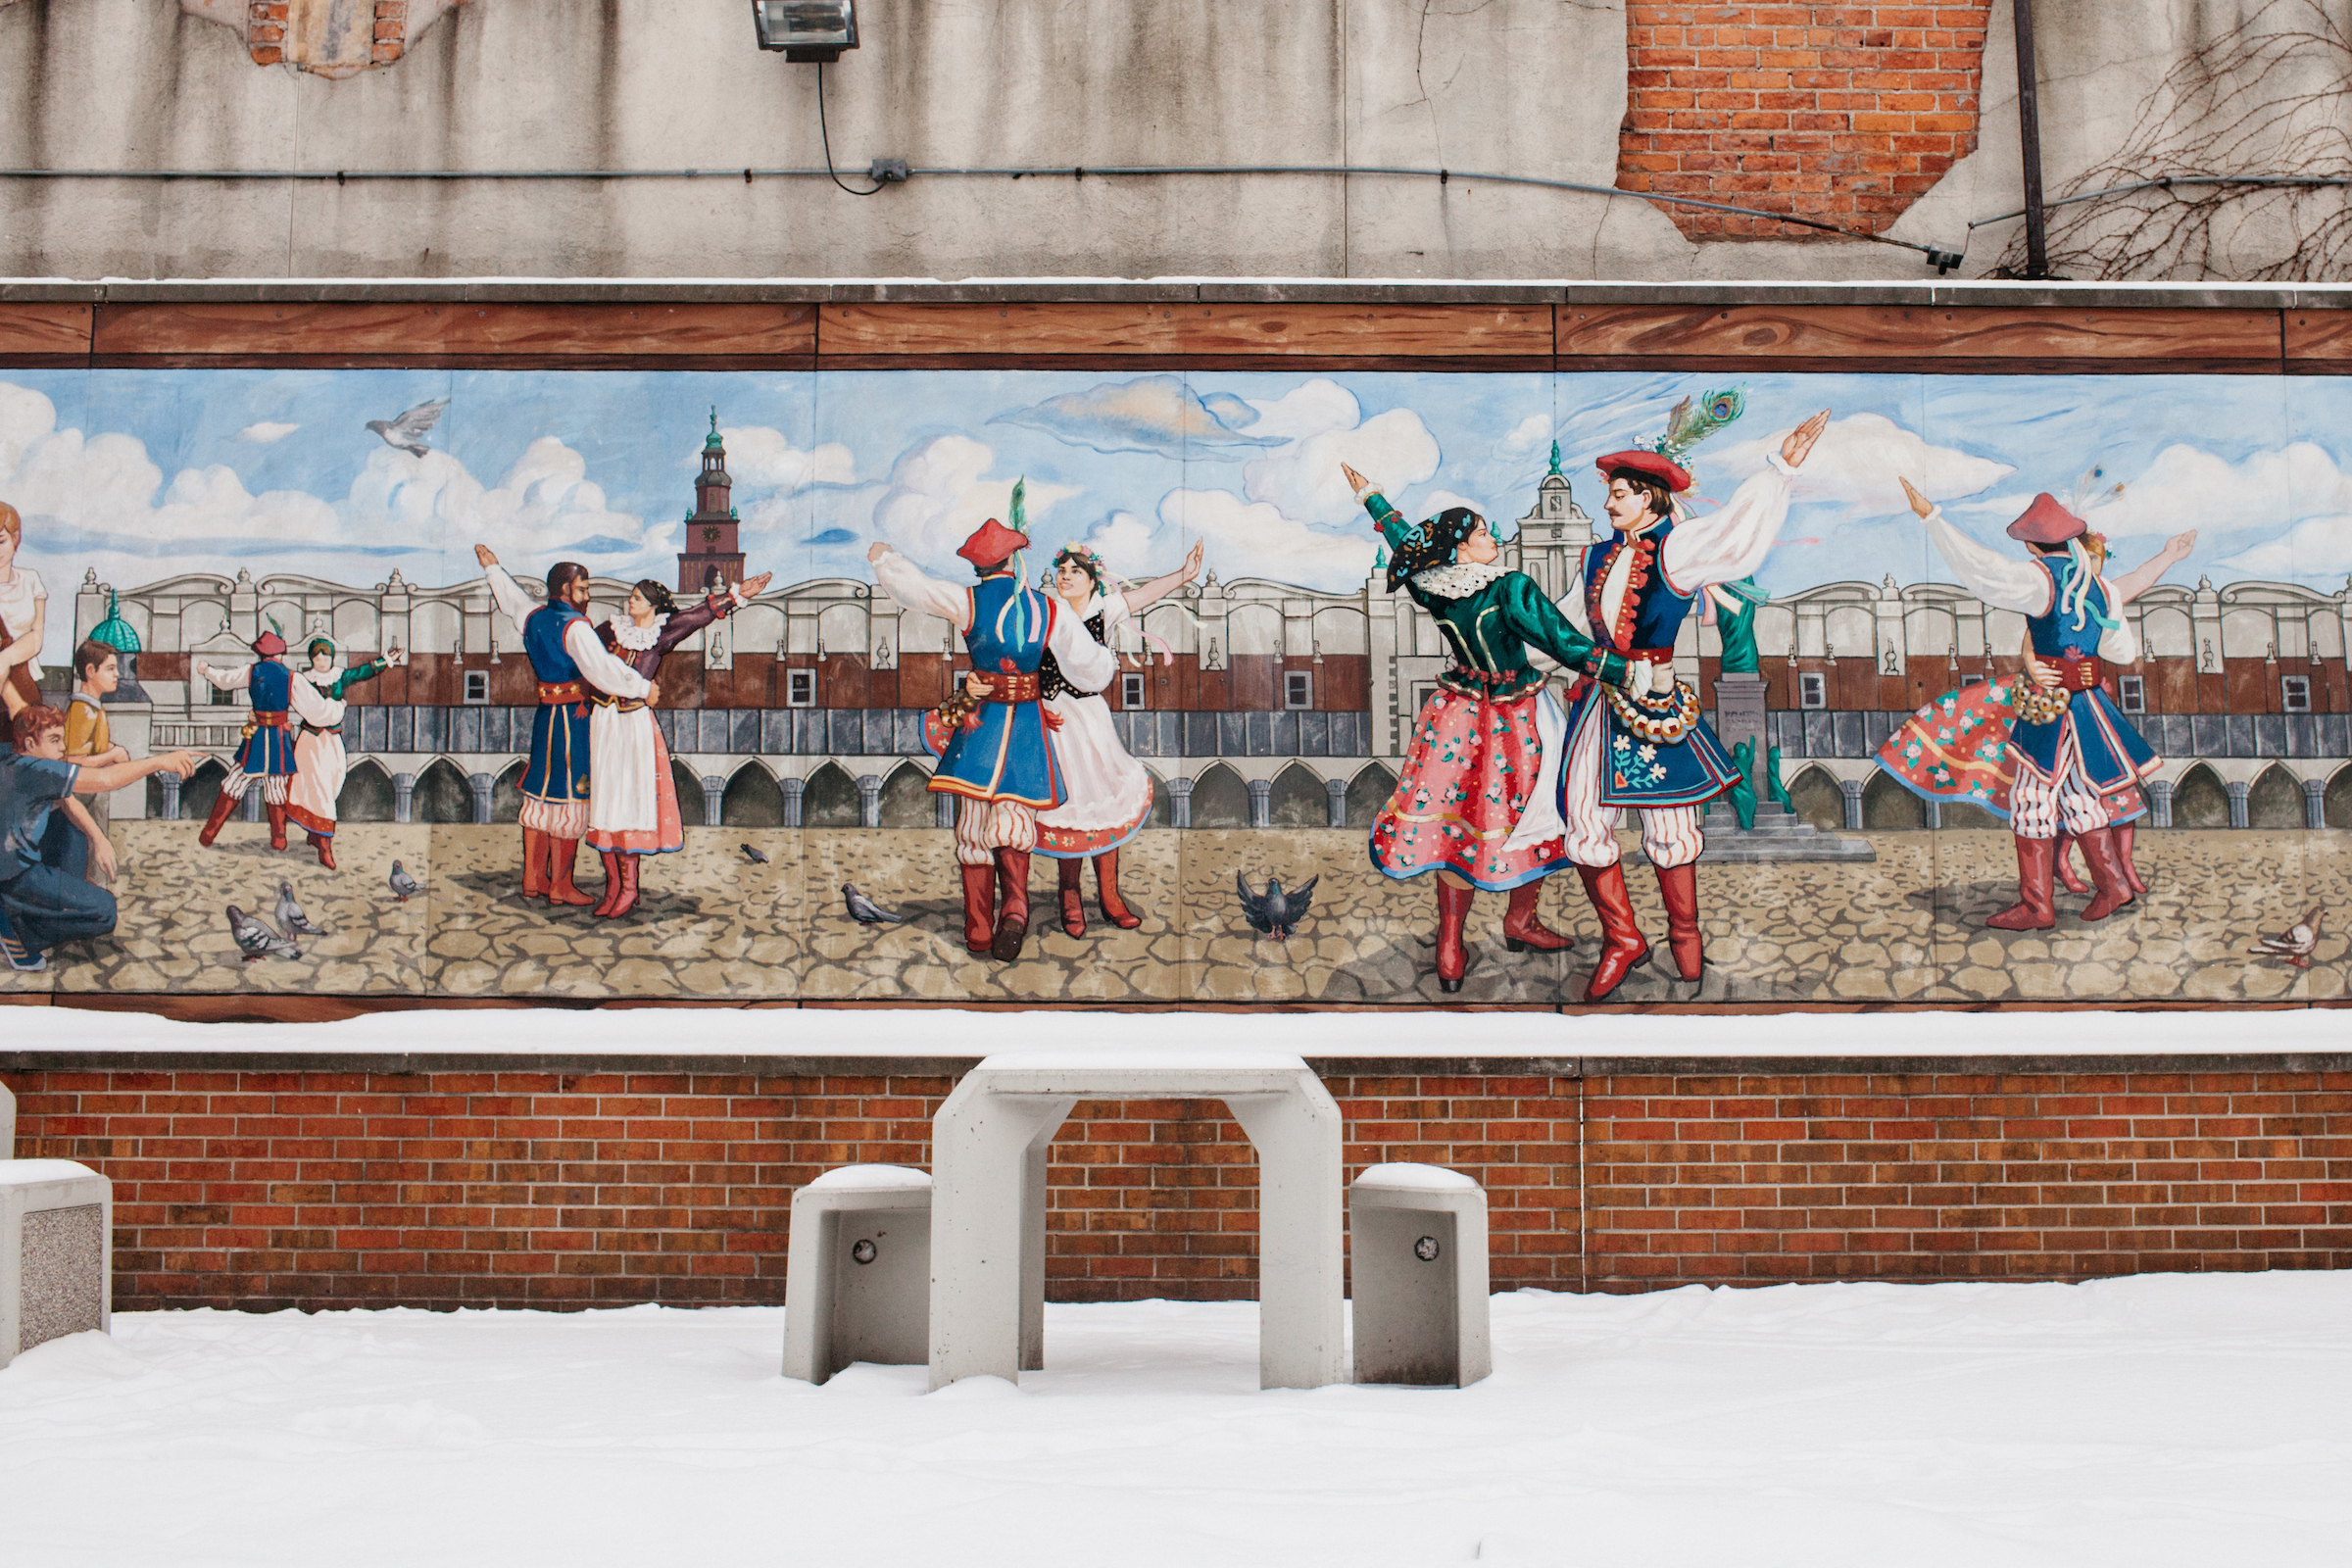 A mural in Hamtramck.